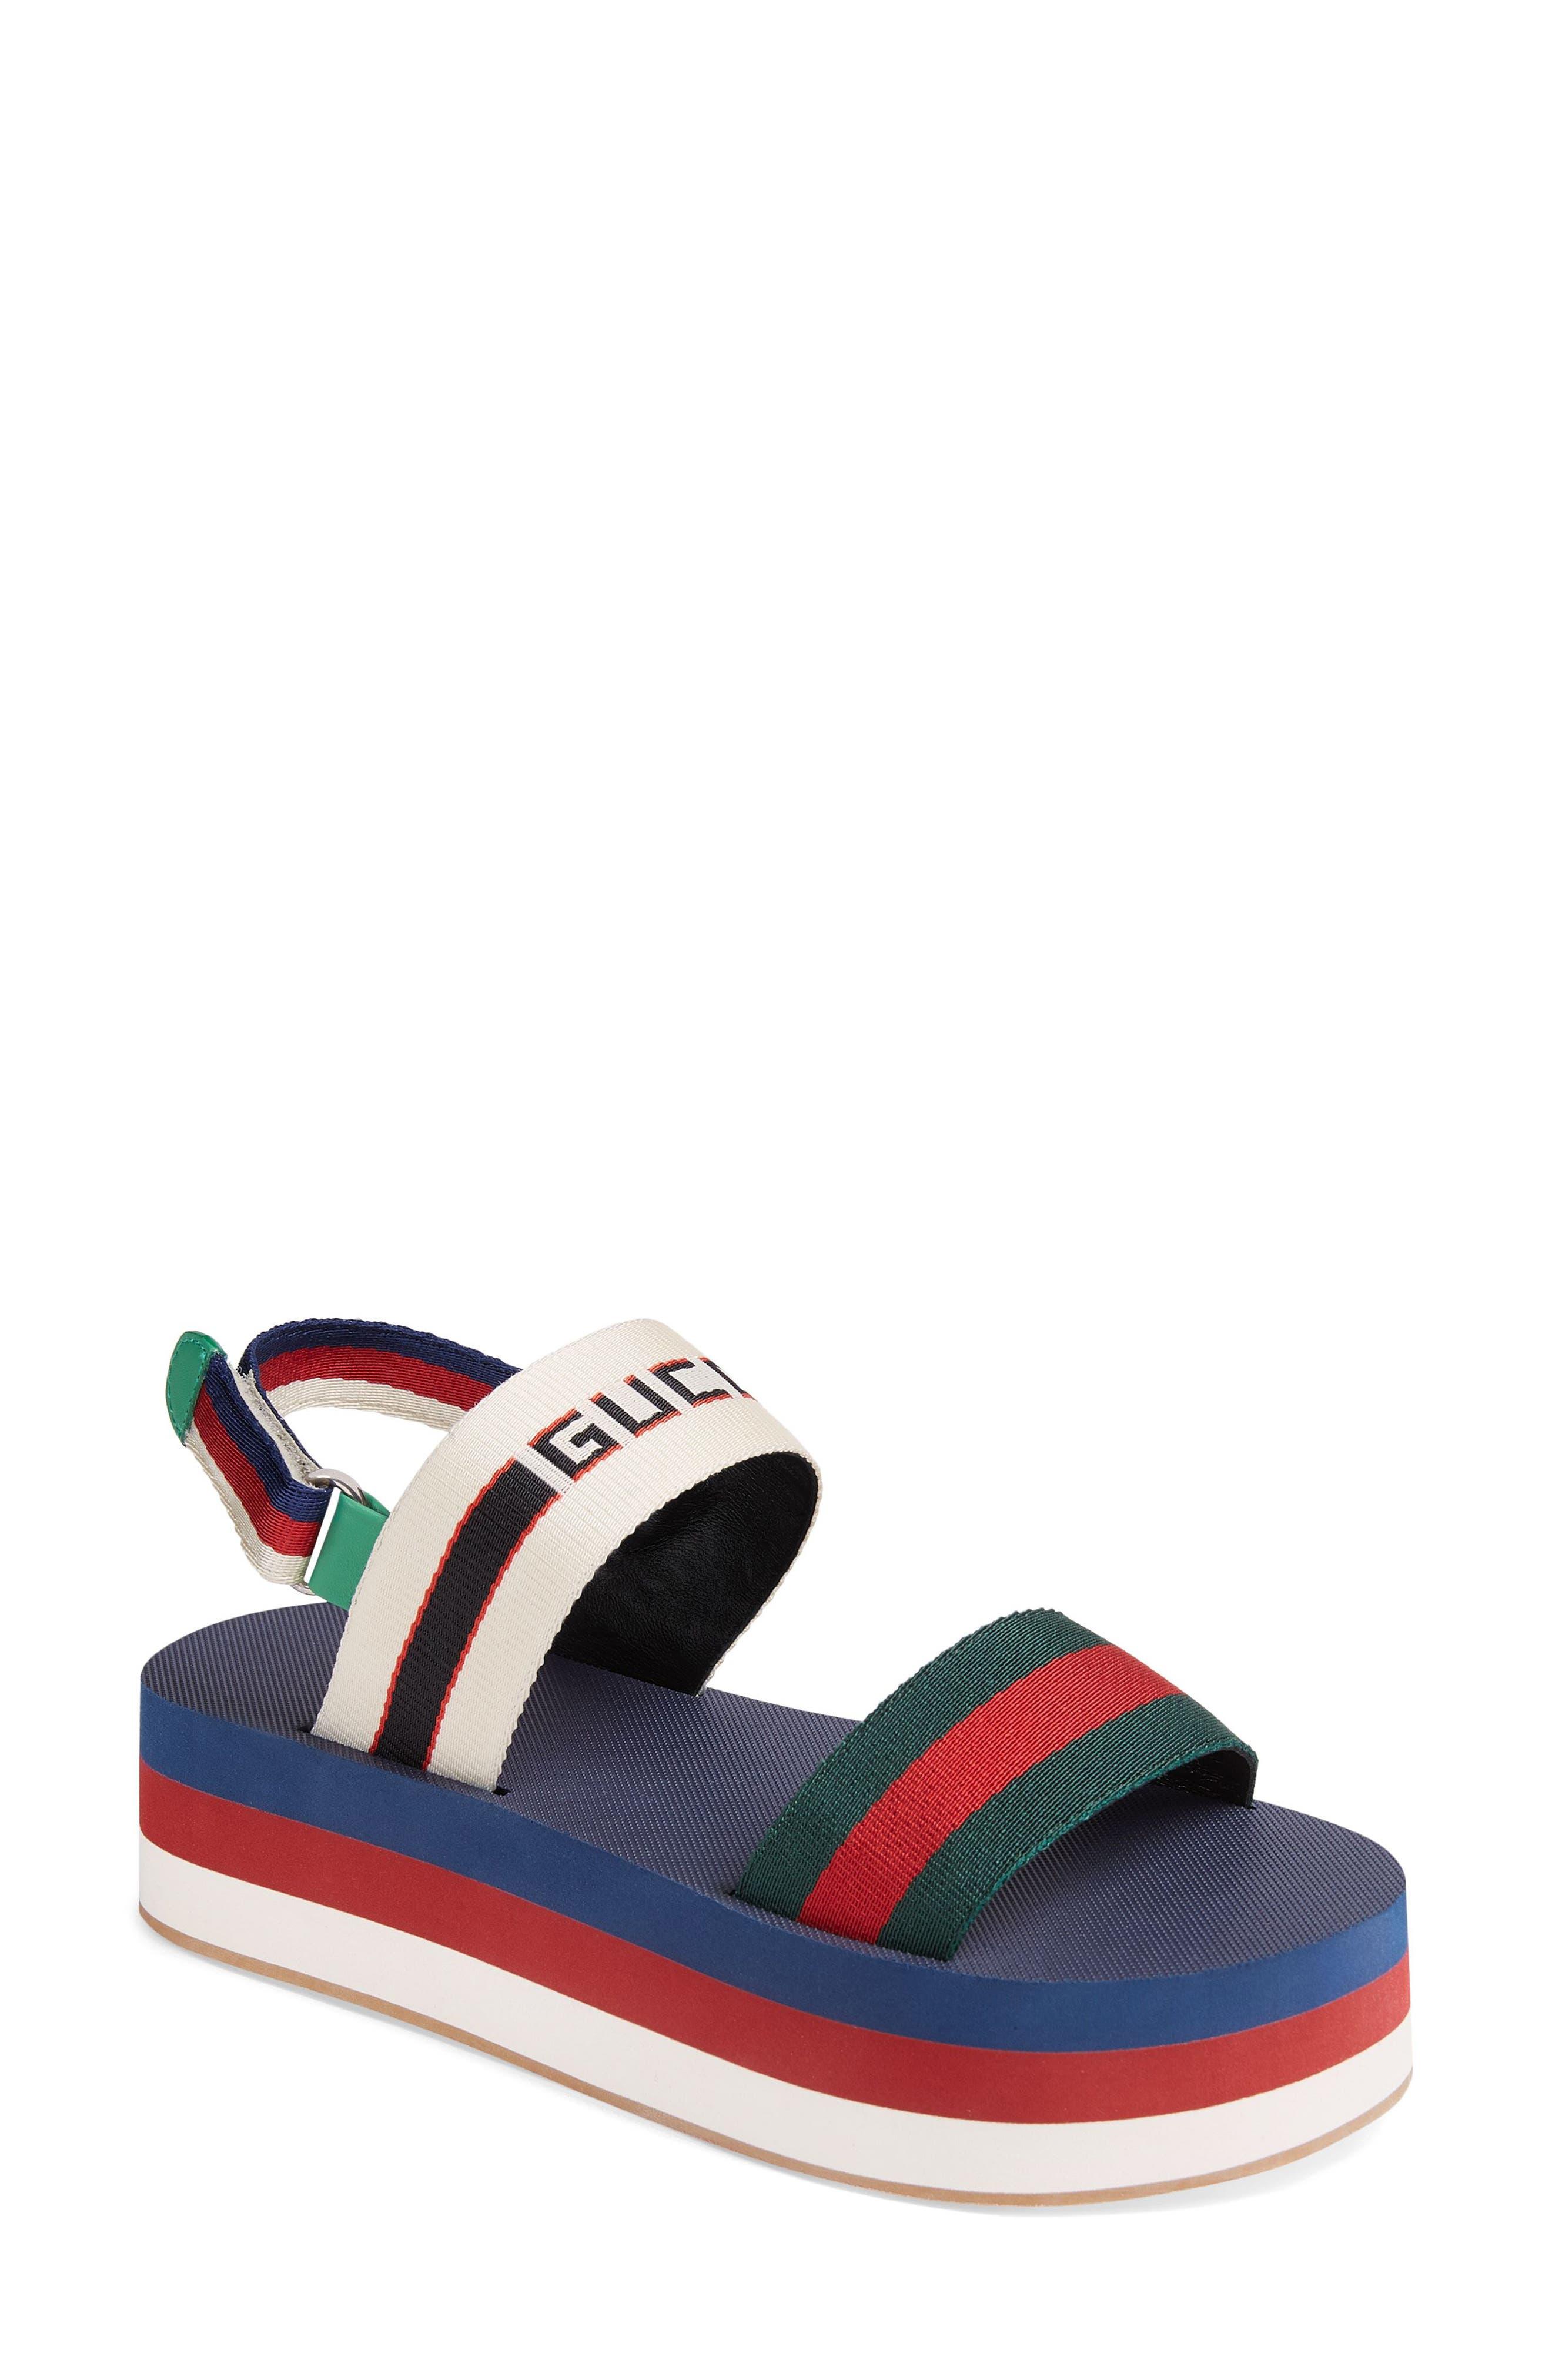 Gucci Bedlam Slingback Flatform Sandal (Women)